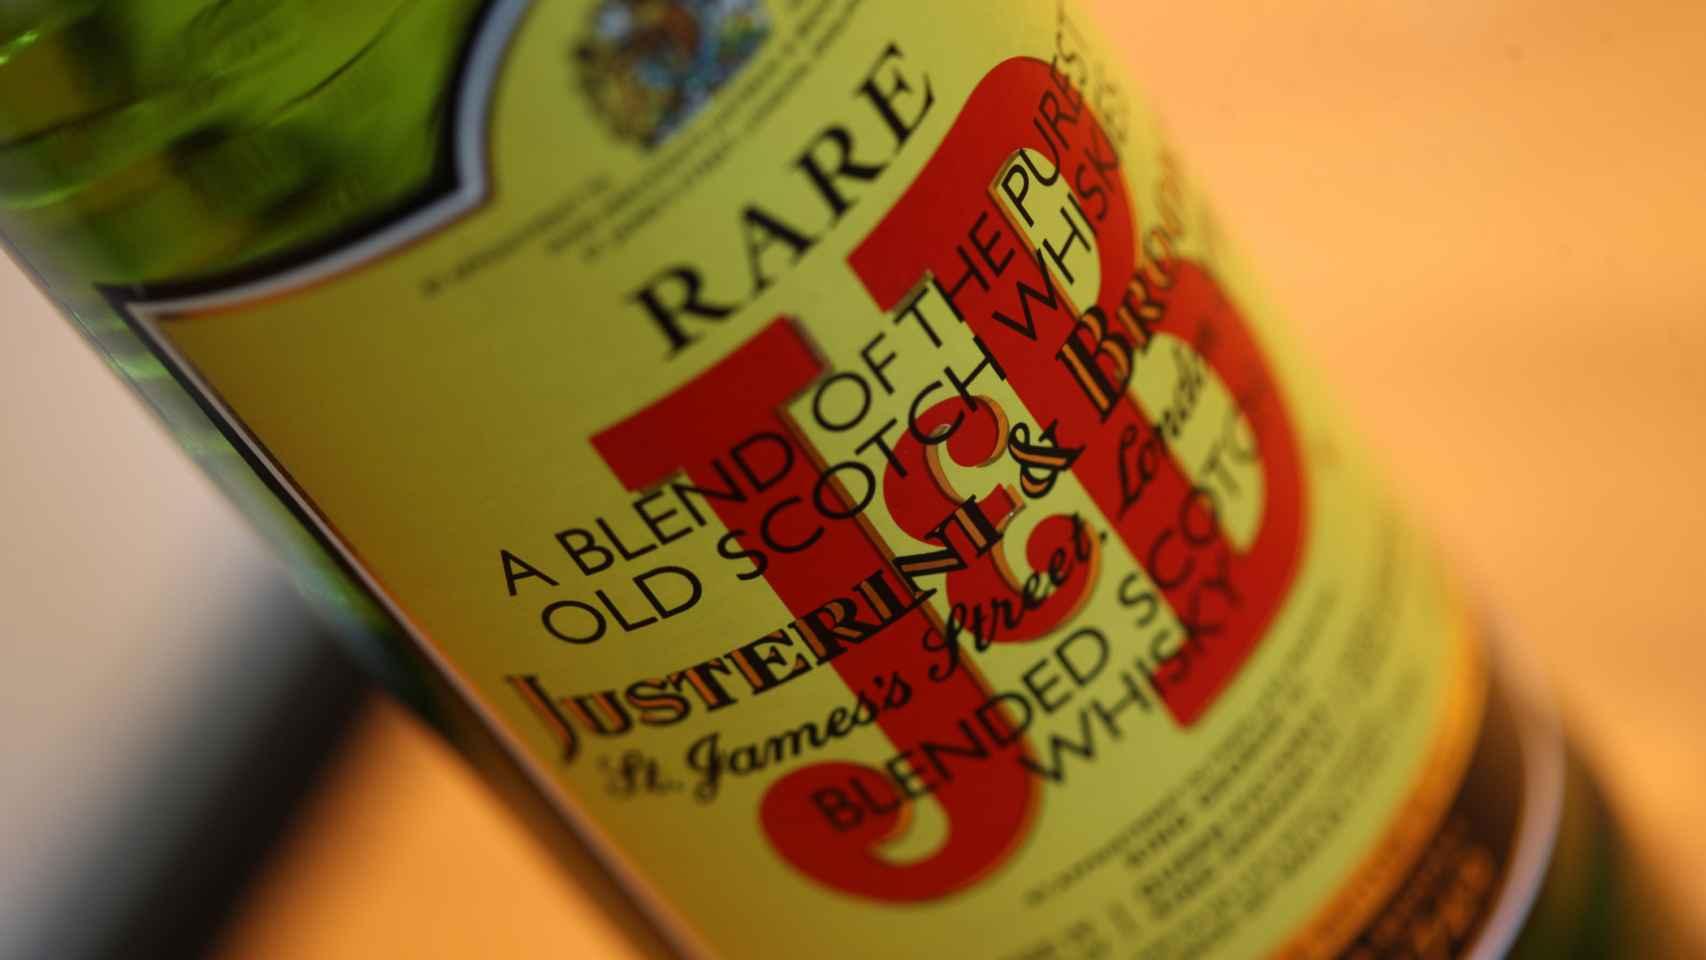 Botella de whisky de la marca J&B, de Diageo.